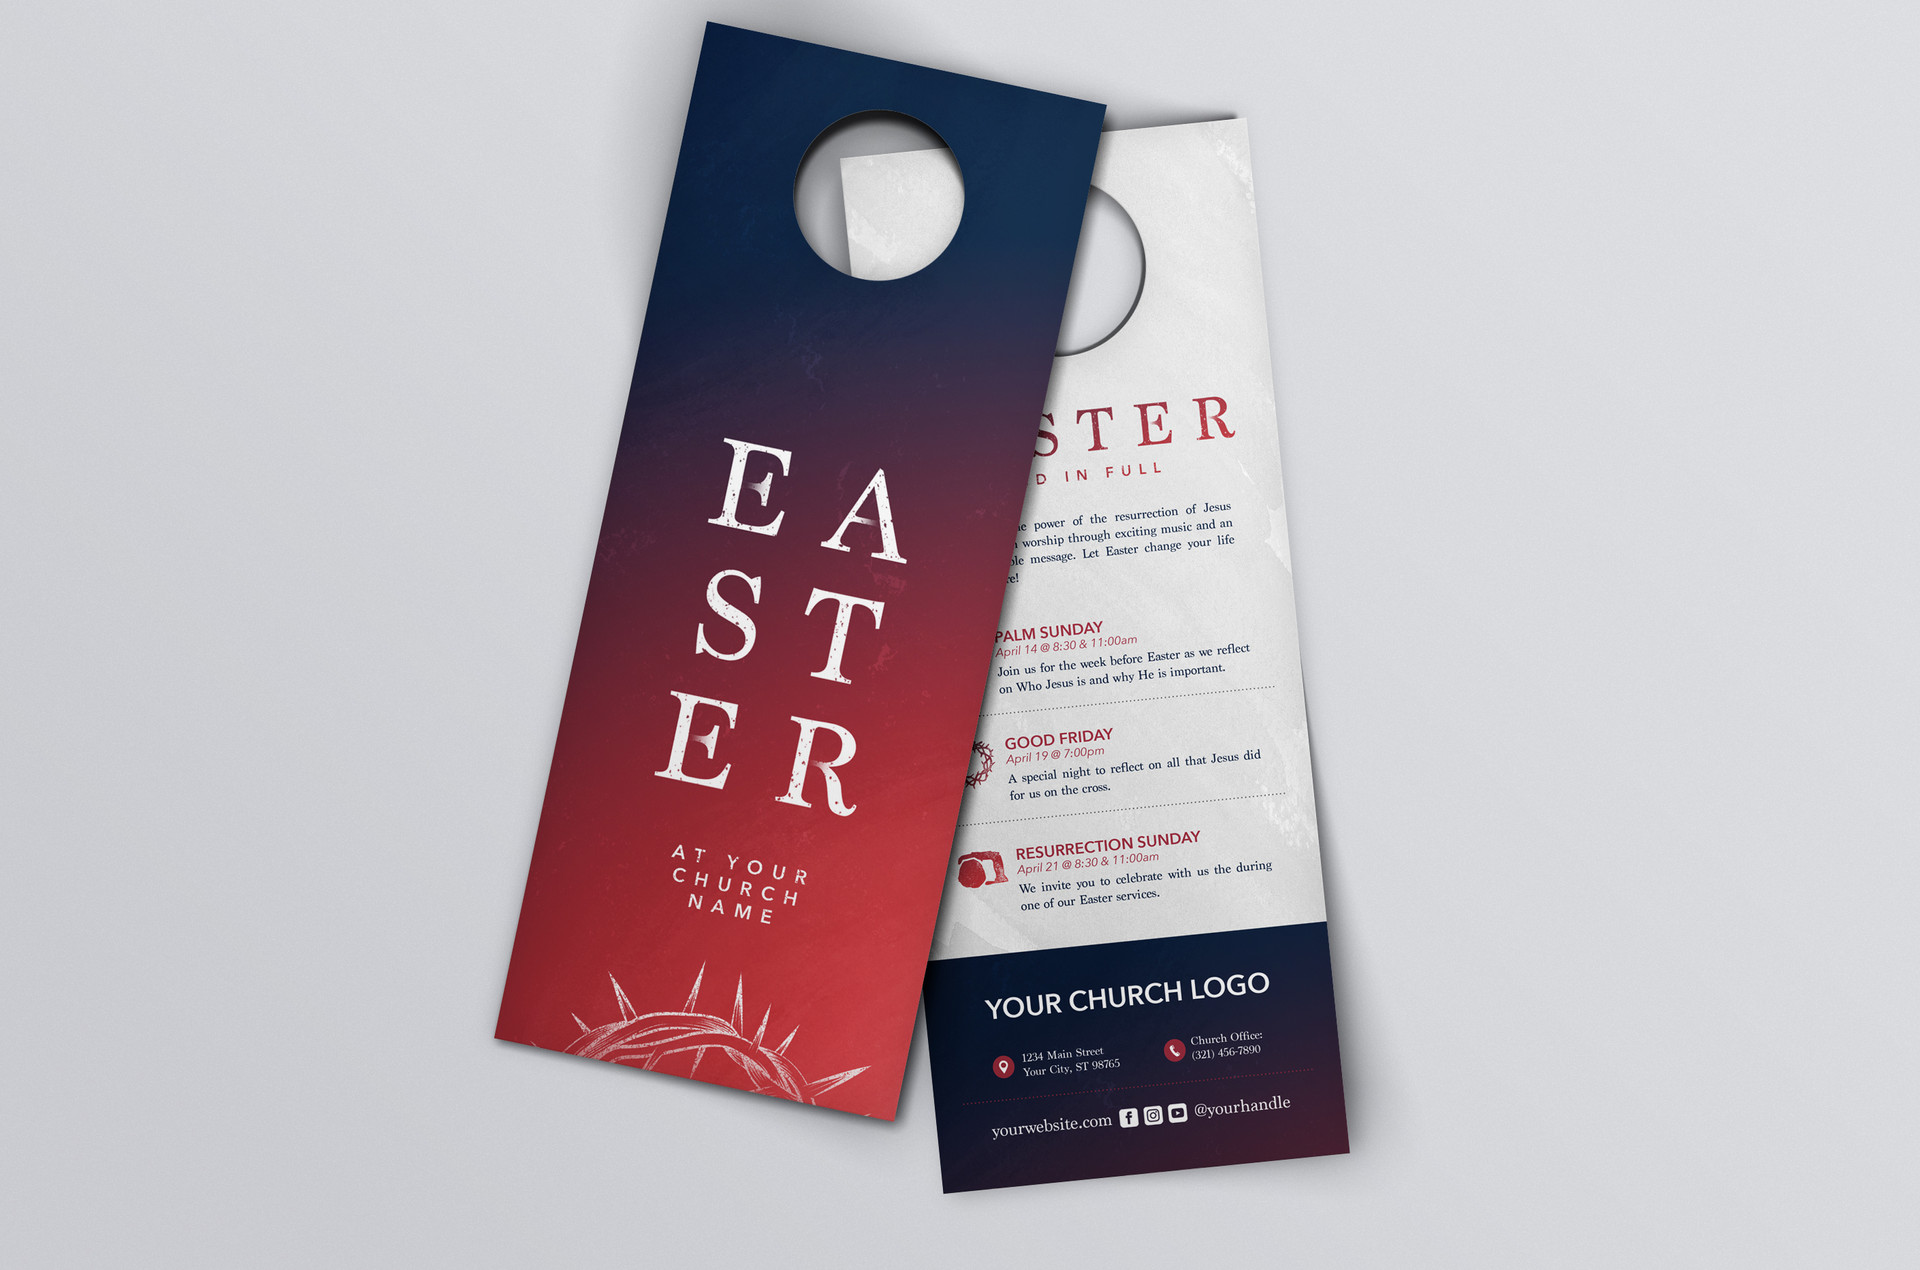 Easter Promotional Hanger